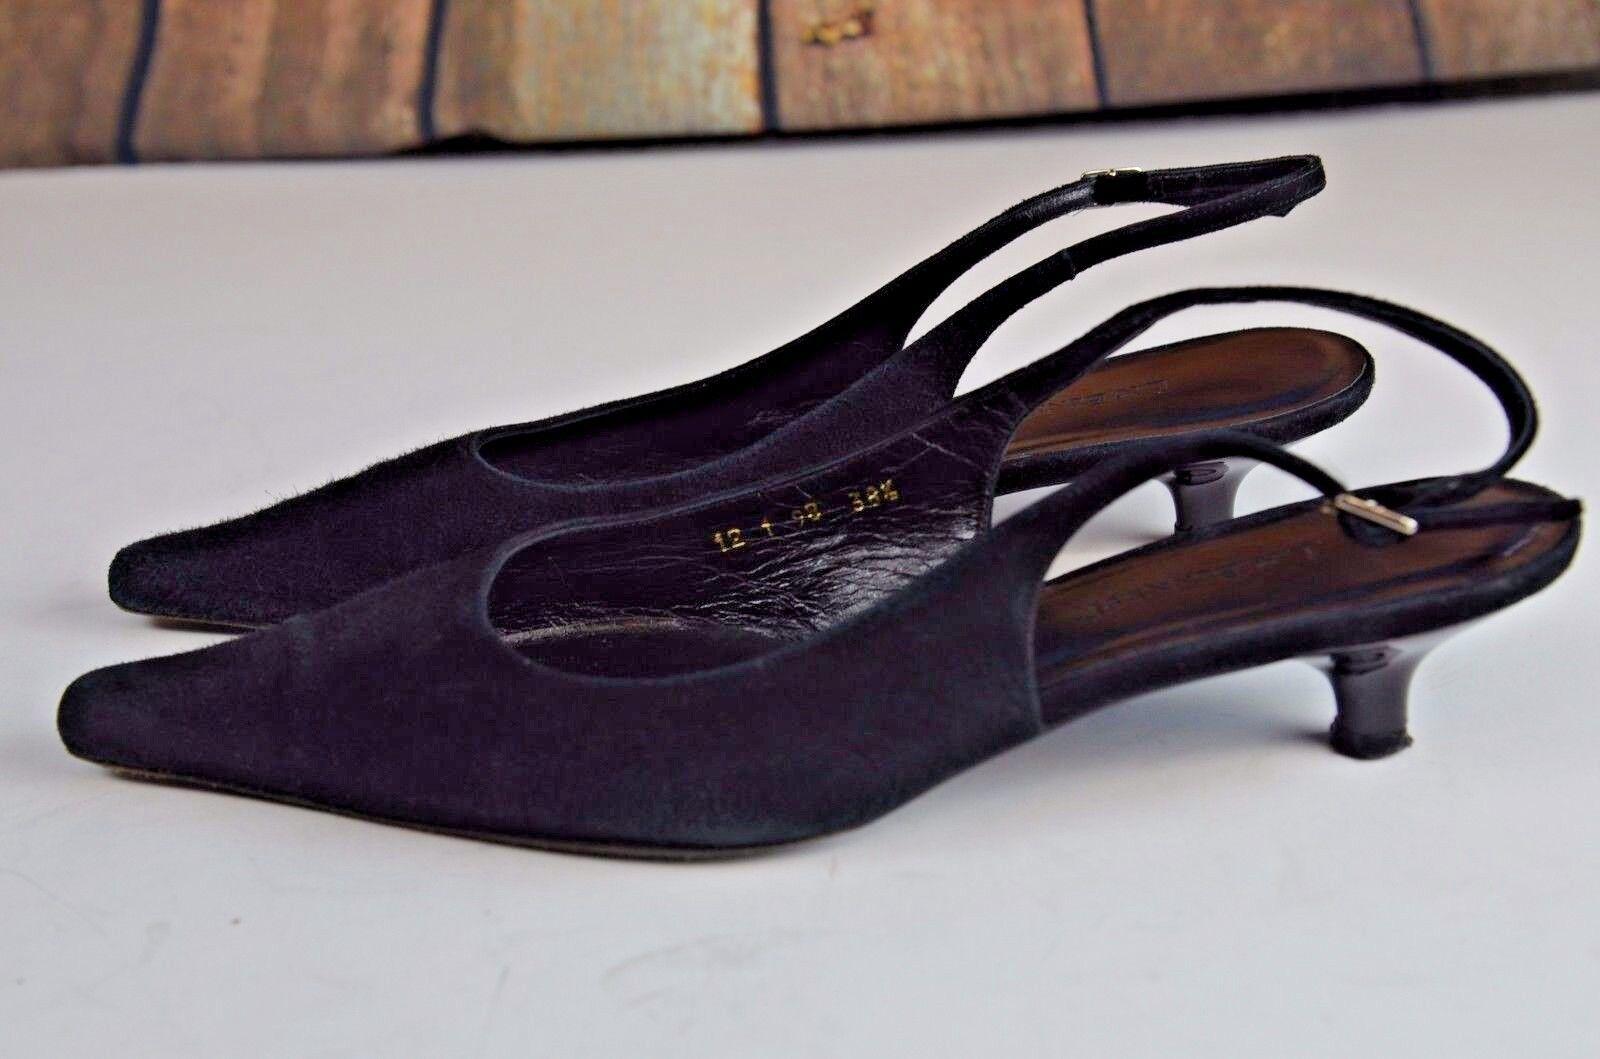 L.K. Bennett Kitten Heel Ankle Strap Pumps US Size 38.5 Spain 8 US Pumps Suede Career eb4822